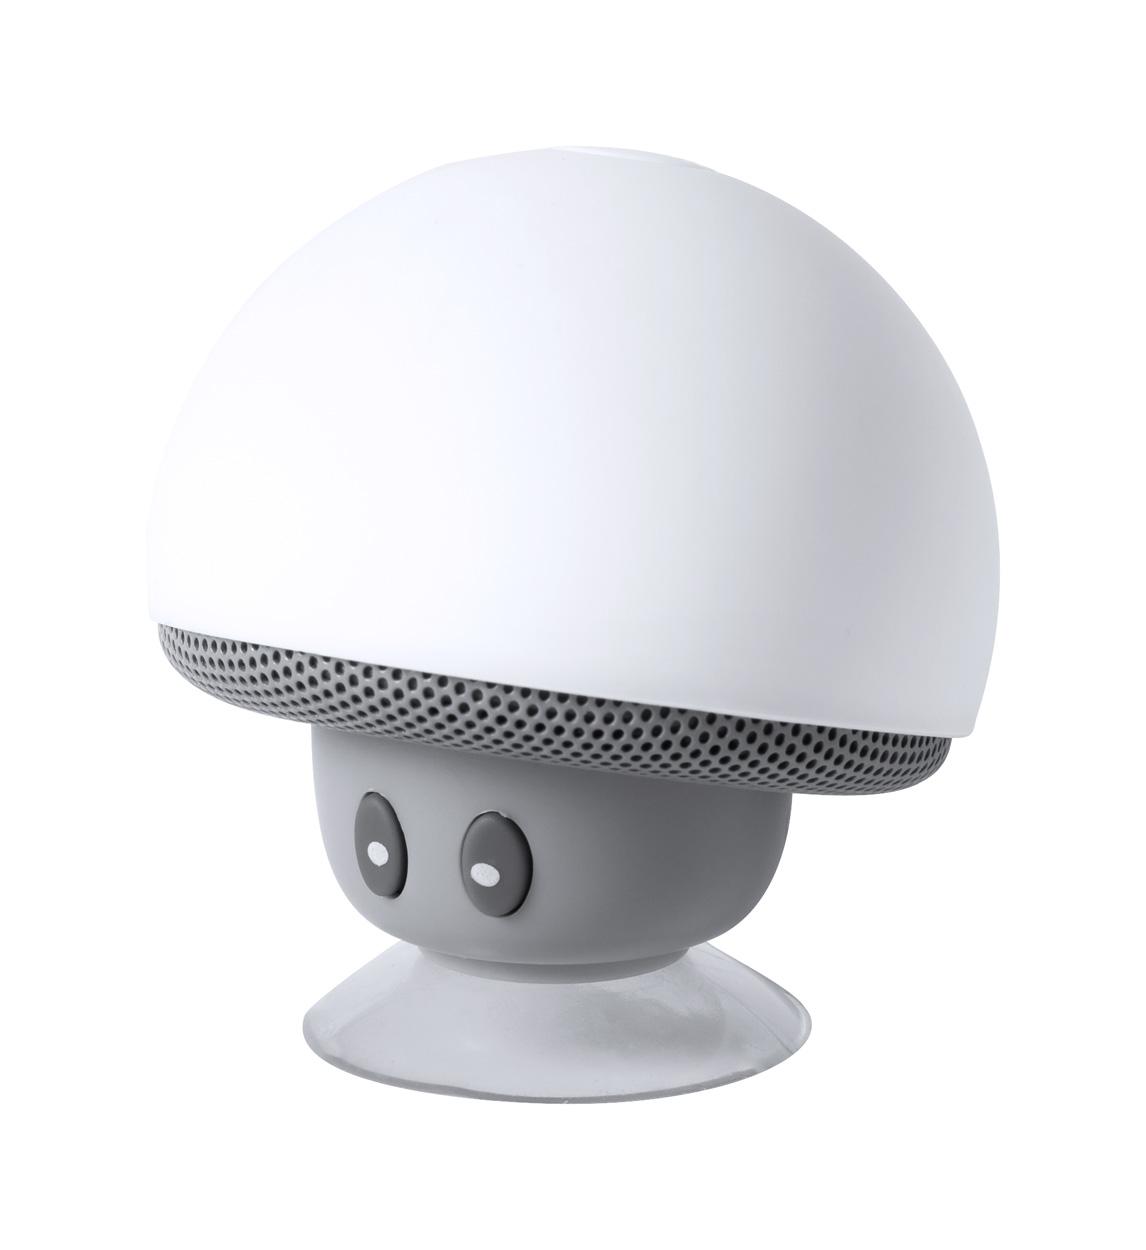 Wanap bluetooth speaker